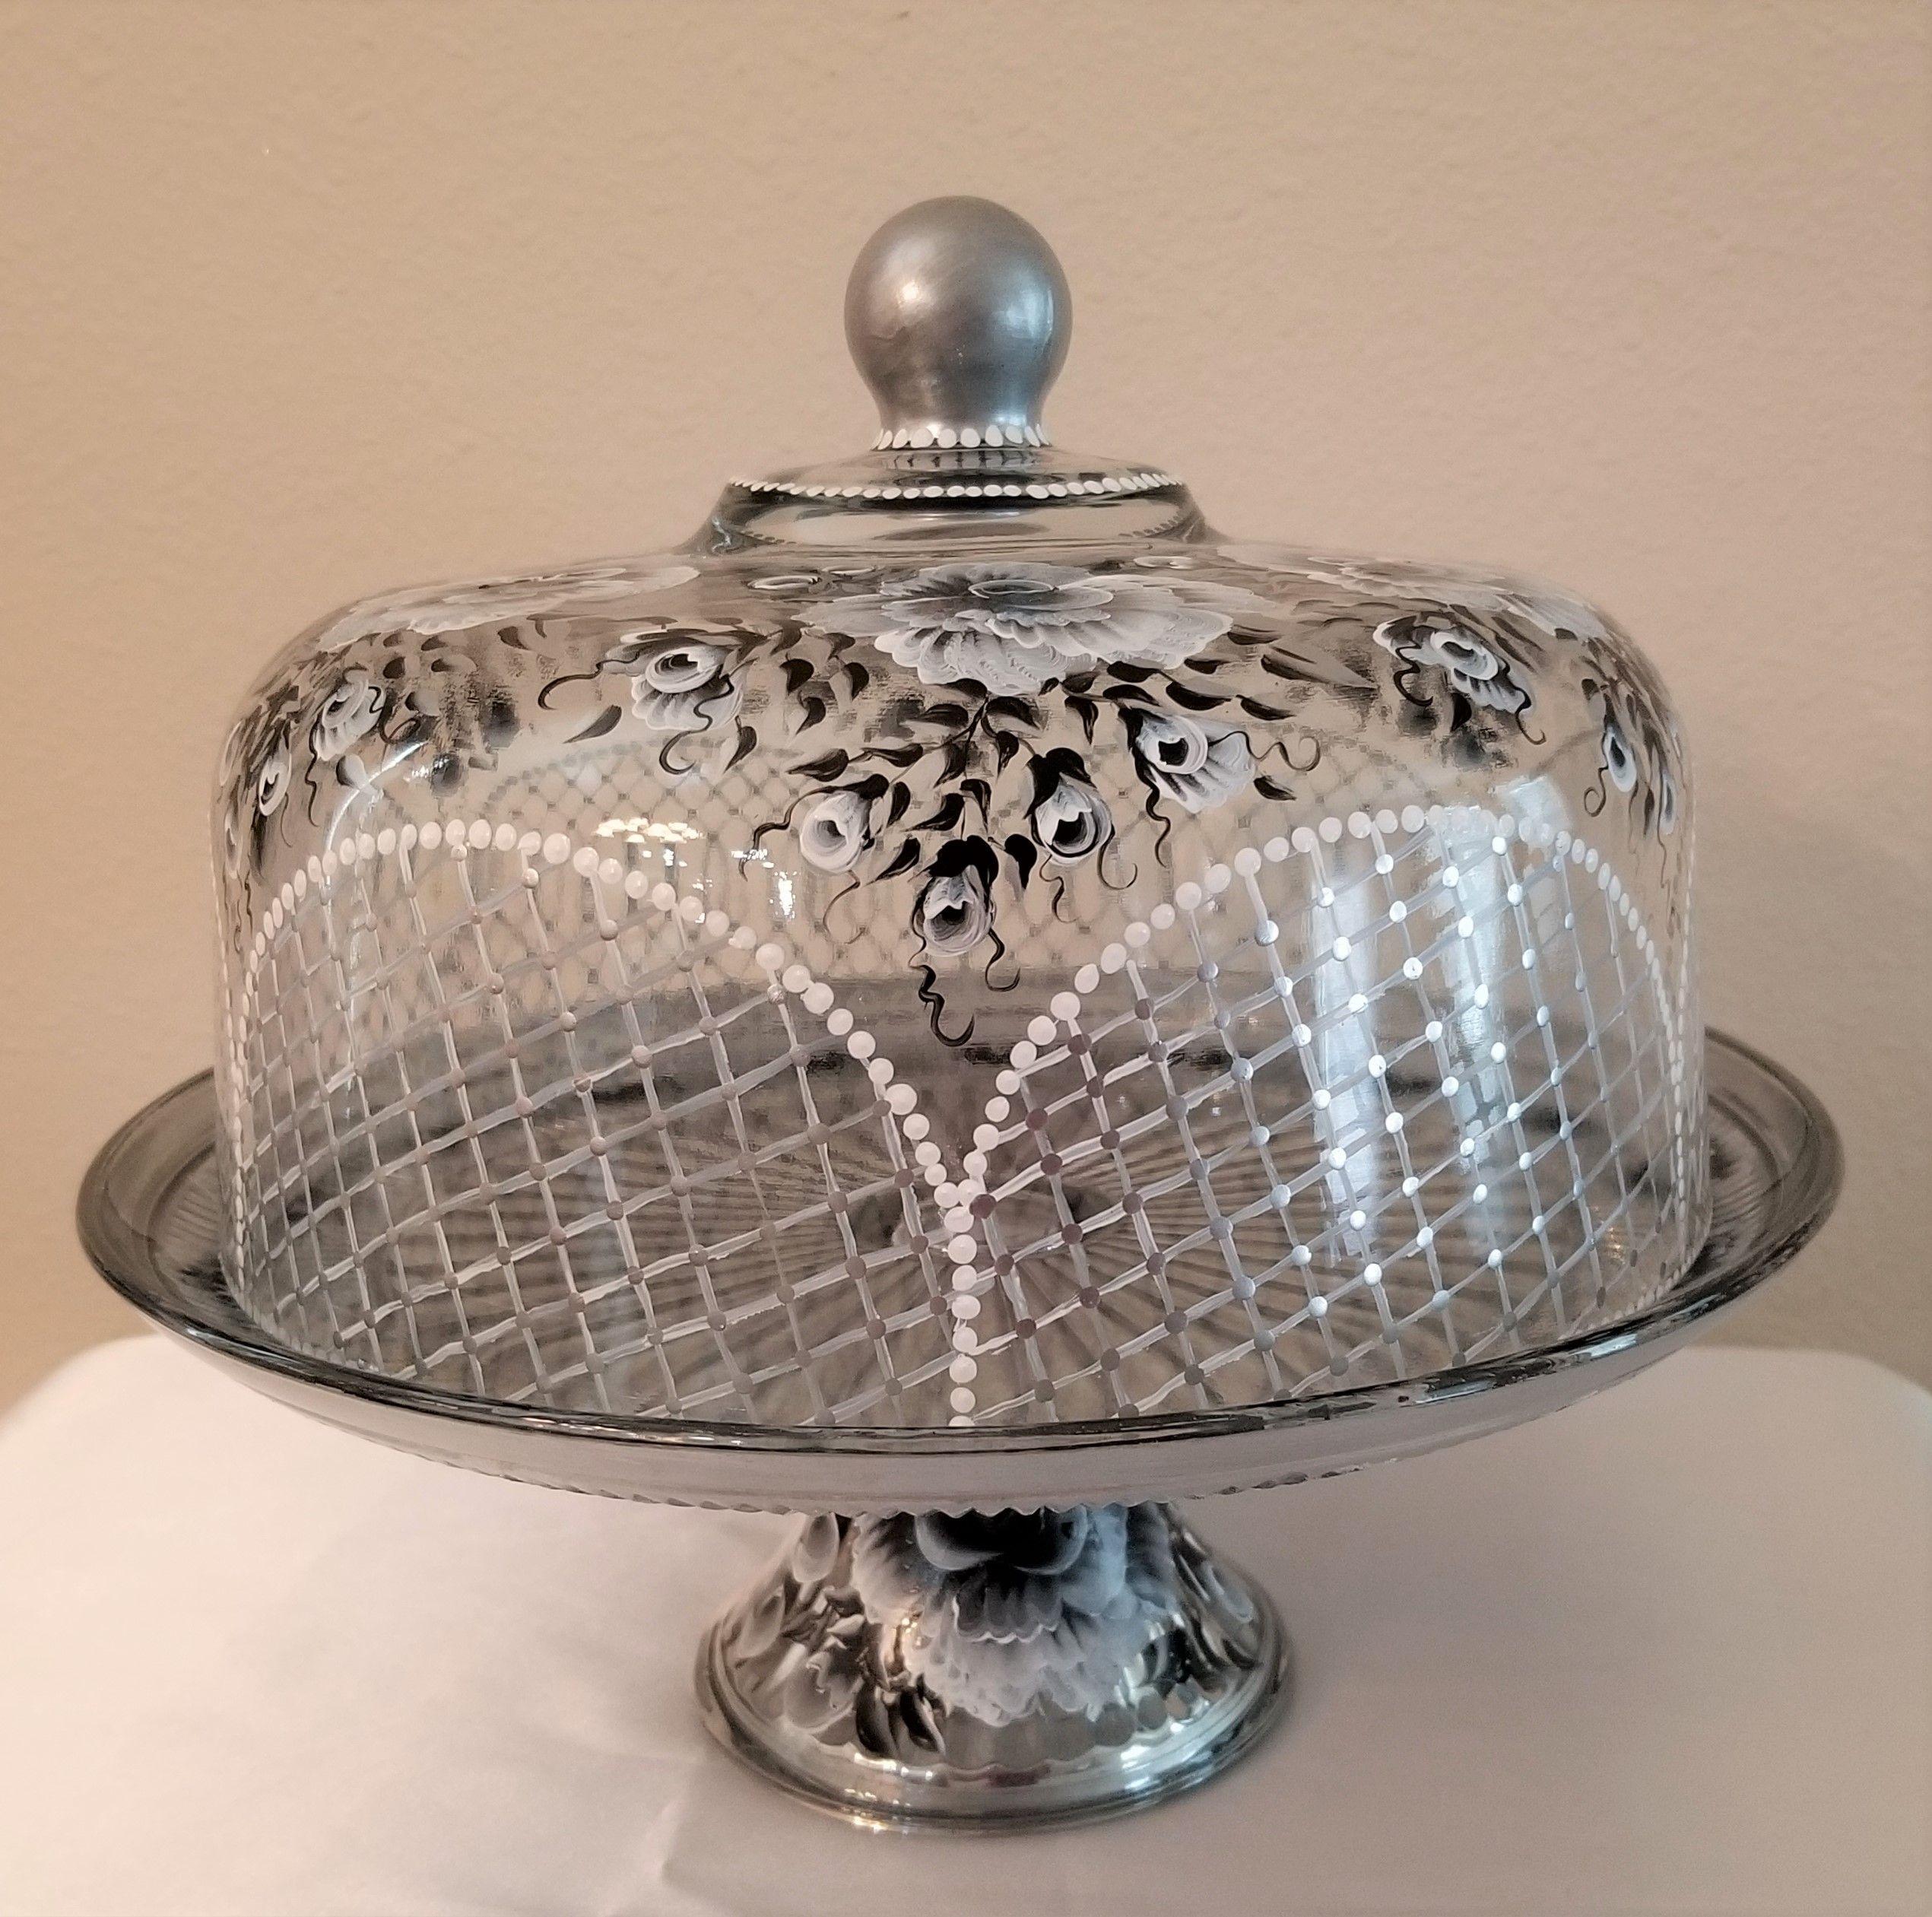 Glass cake stand dome pedestal plate black white hand